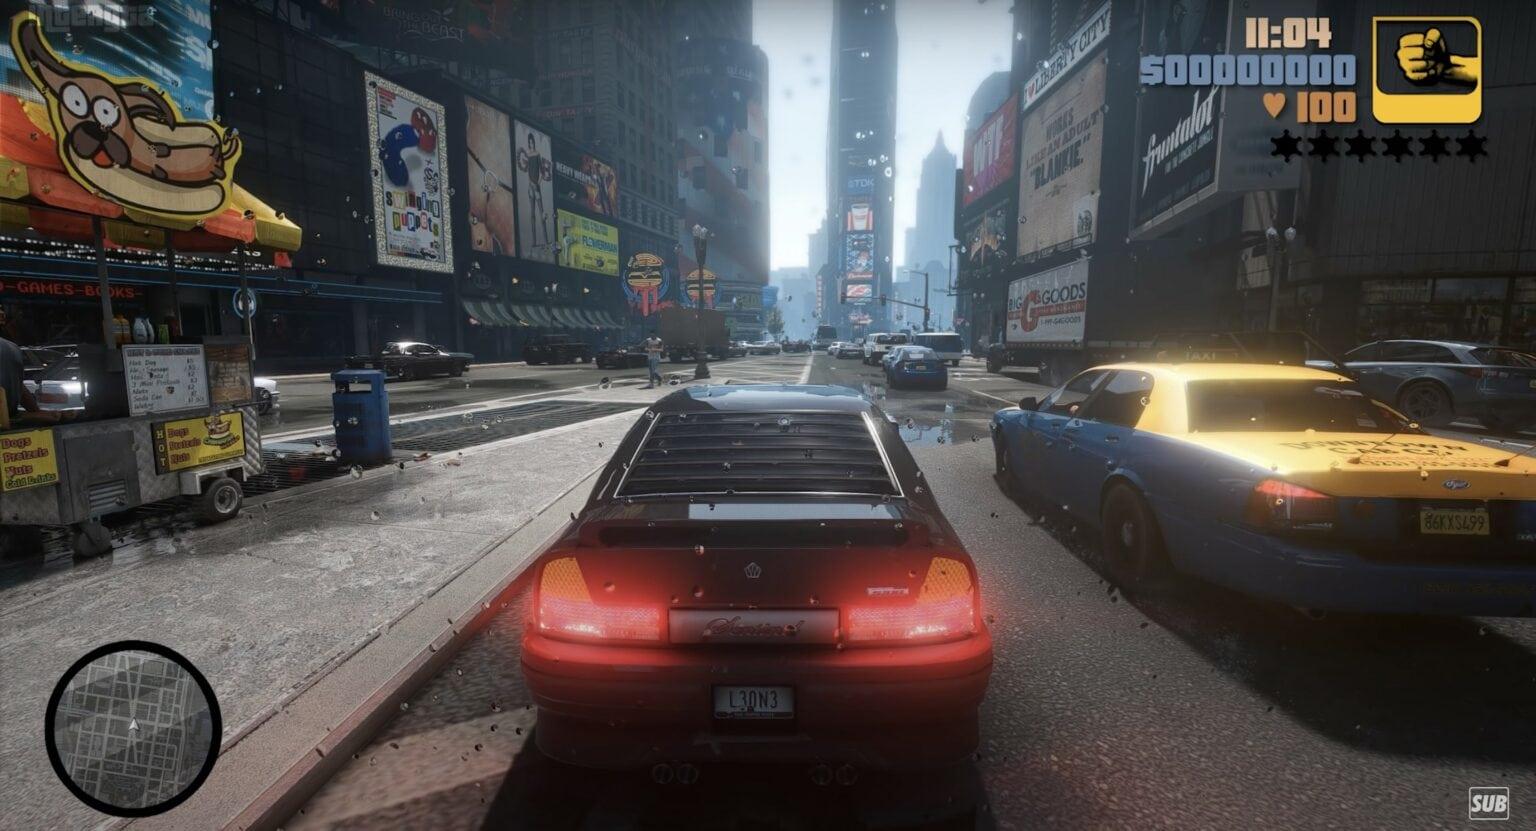 GTA III remastered concept